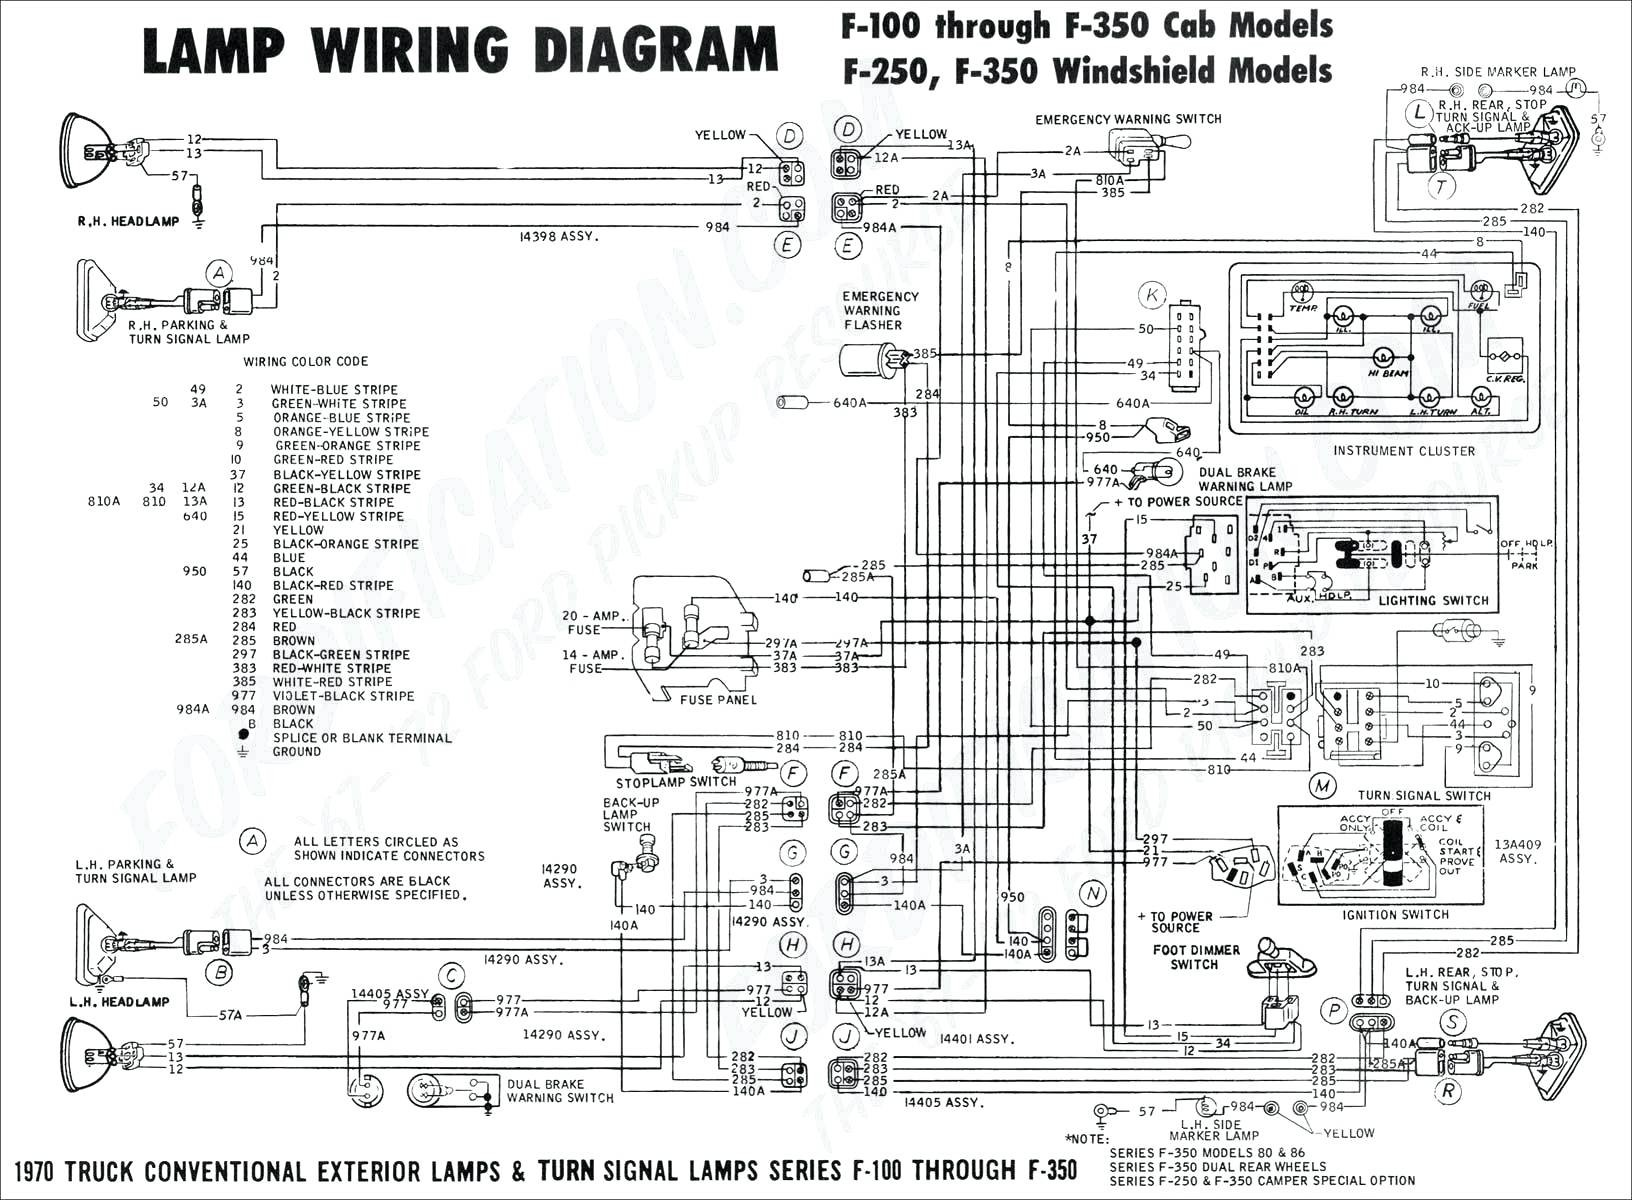 2005 toyota corolla ce fuse diagram wiring library 2007 toyota tundra parts diagram leryn franco in addition 2000 toyota tundra fuel pump wiring diagram